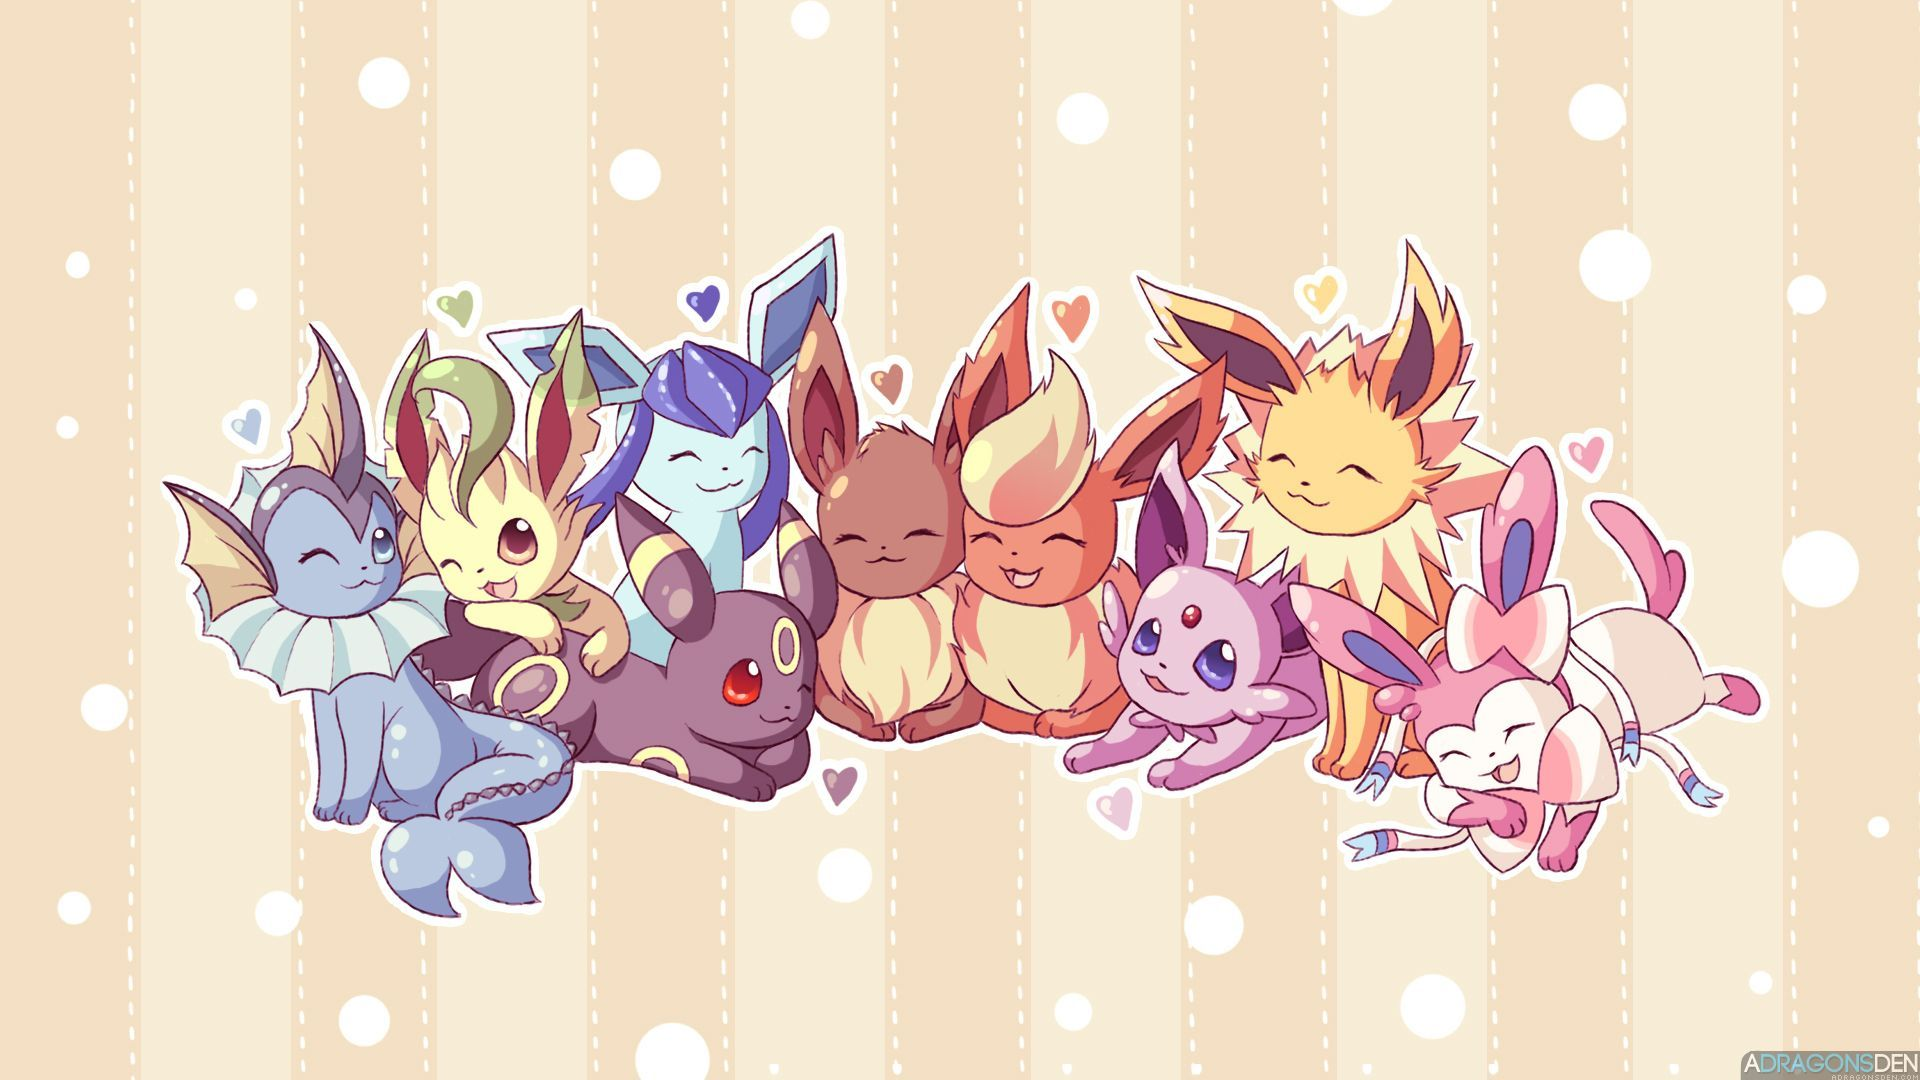 Kawaii Eevee Pokemon Wallpapers Top Free Kawaii Eevee Pokemon